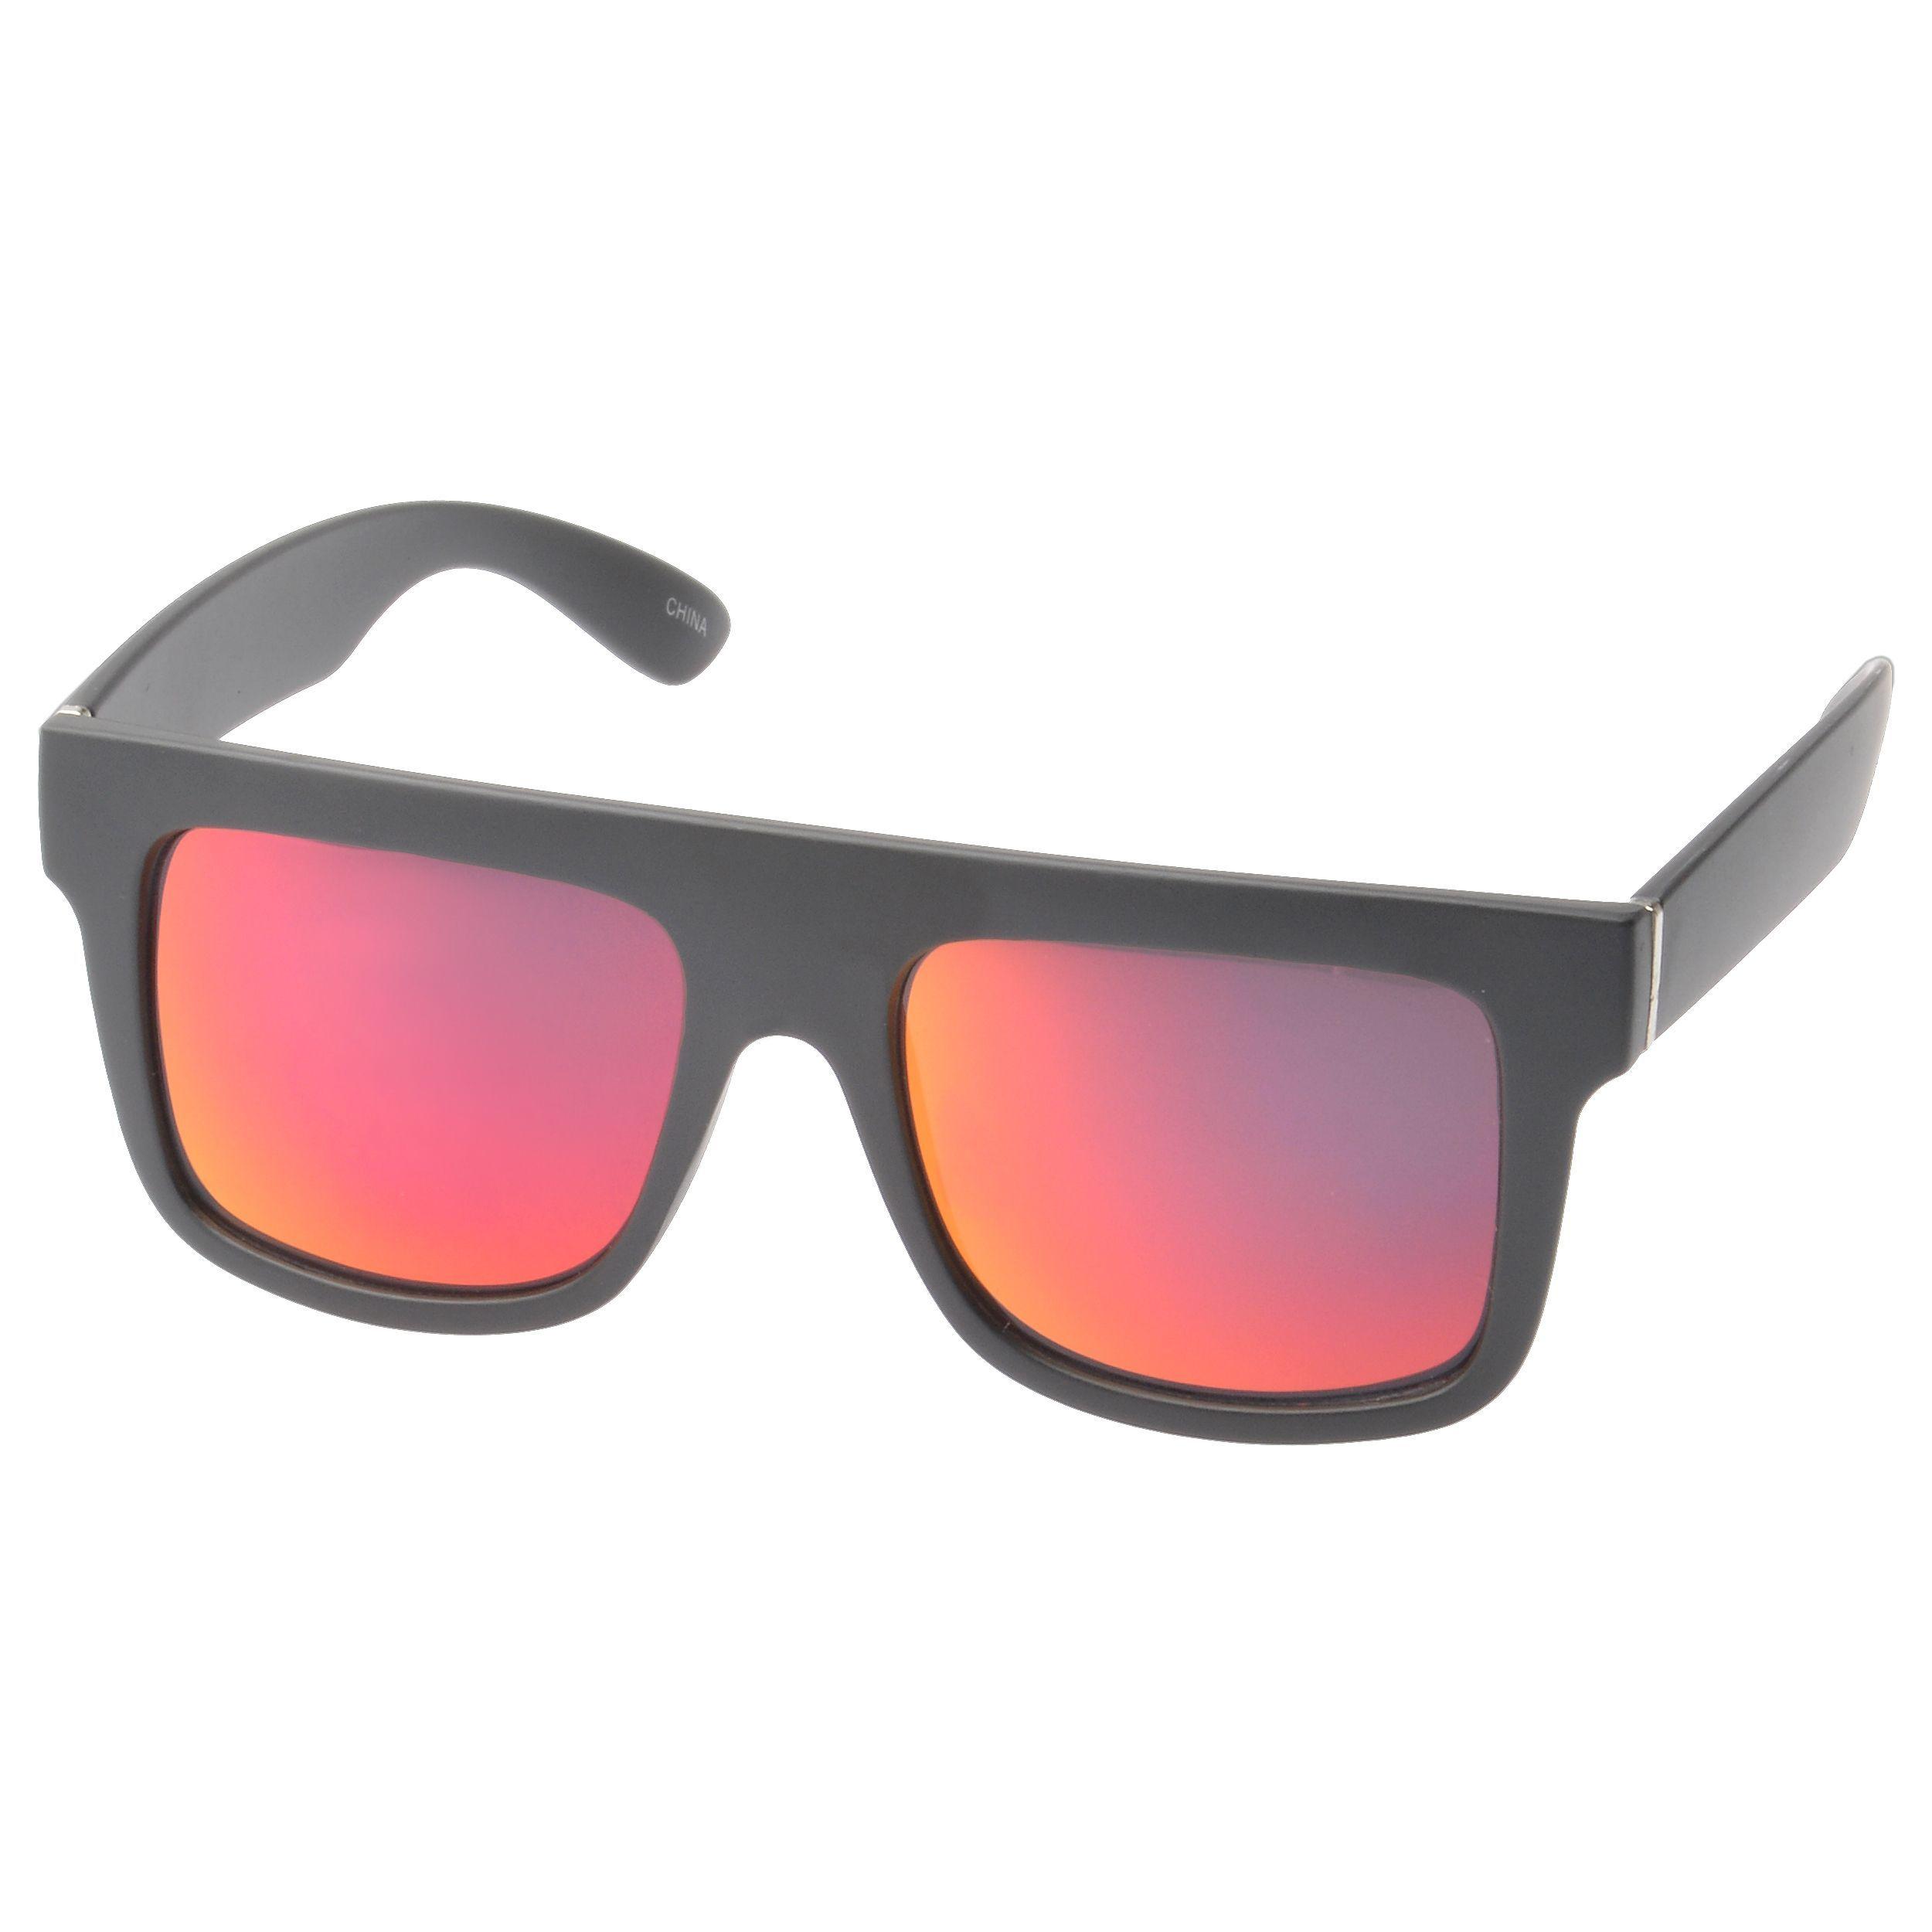 Epic Eyewear 'Bradbury' Square Fashion Sunglasses, Men's